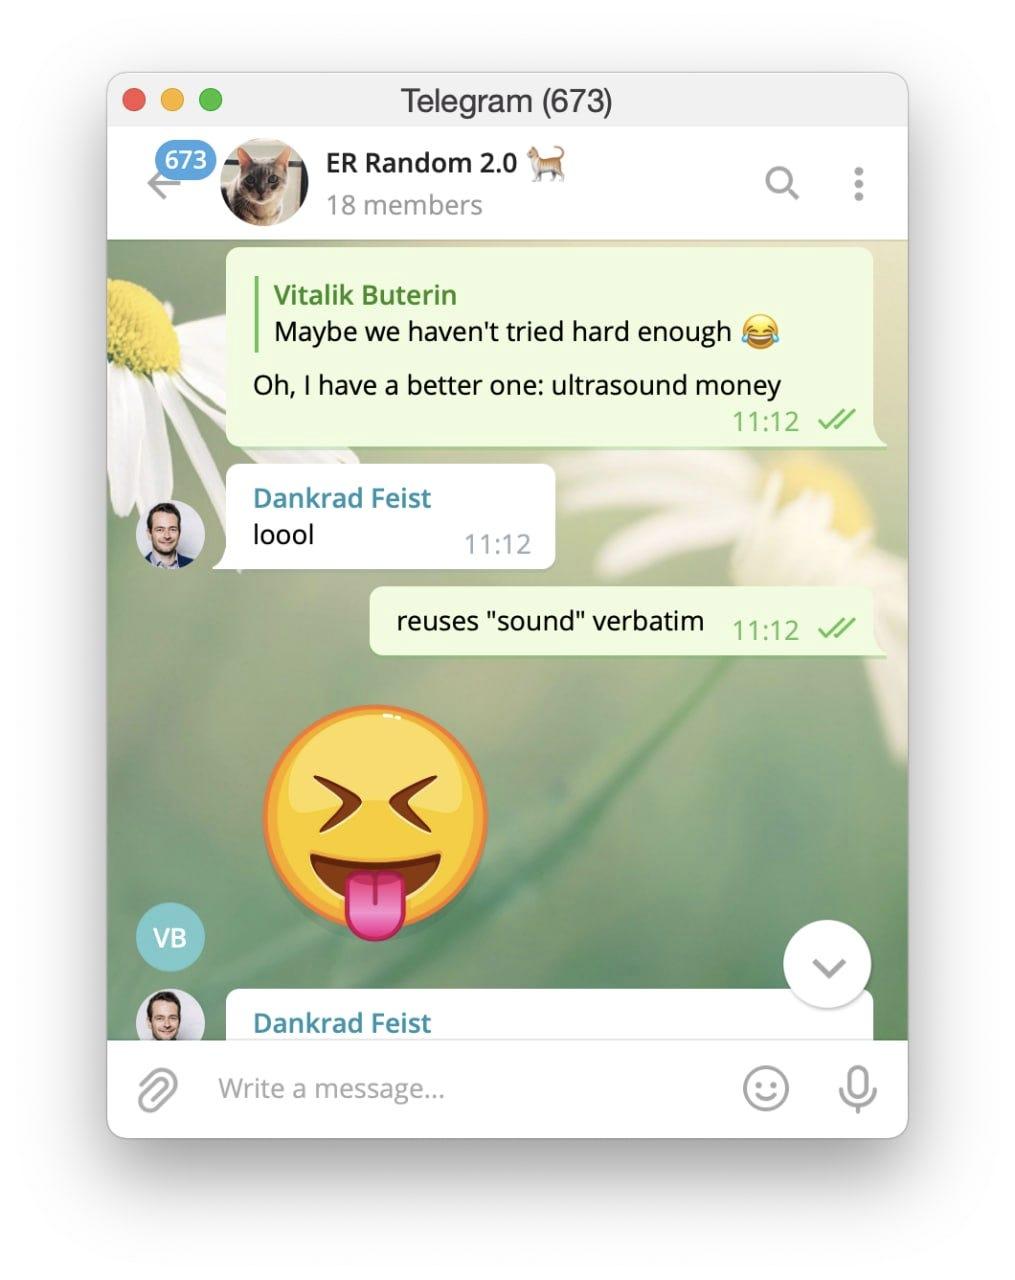 Telegram screenshot shared with permission